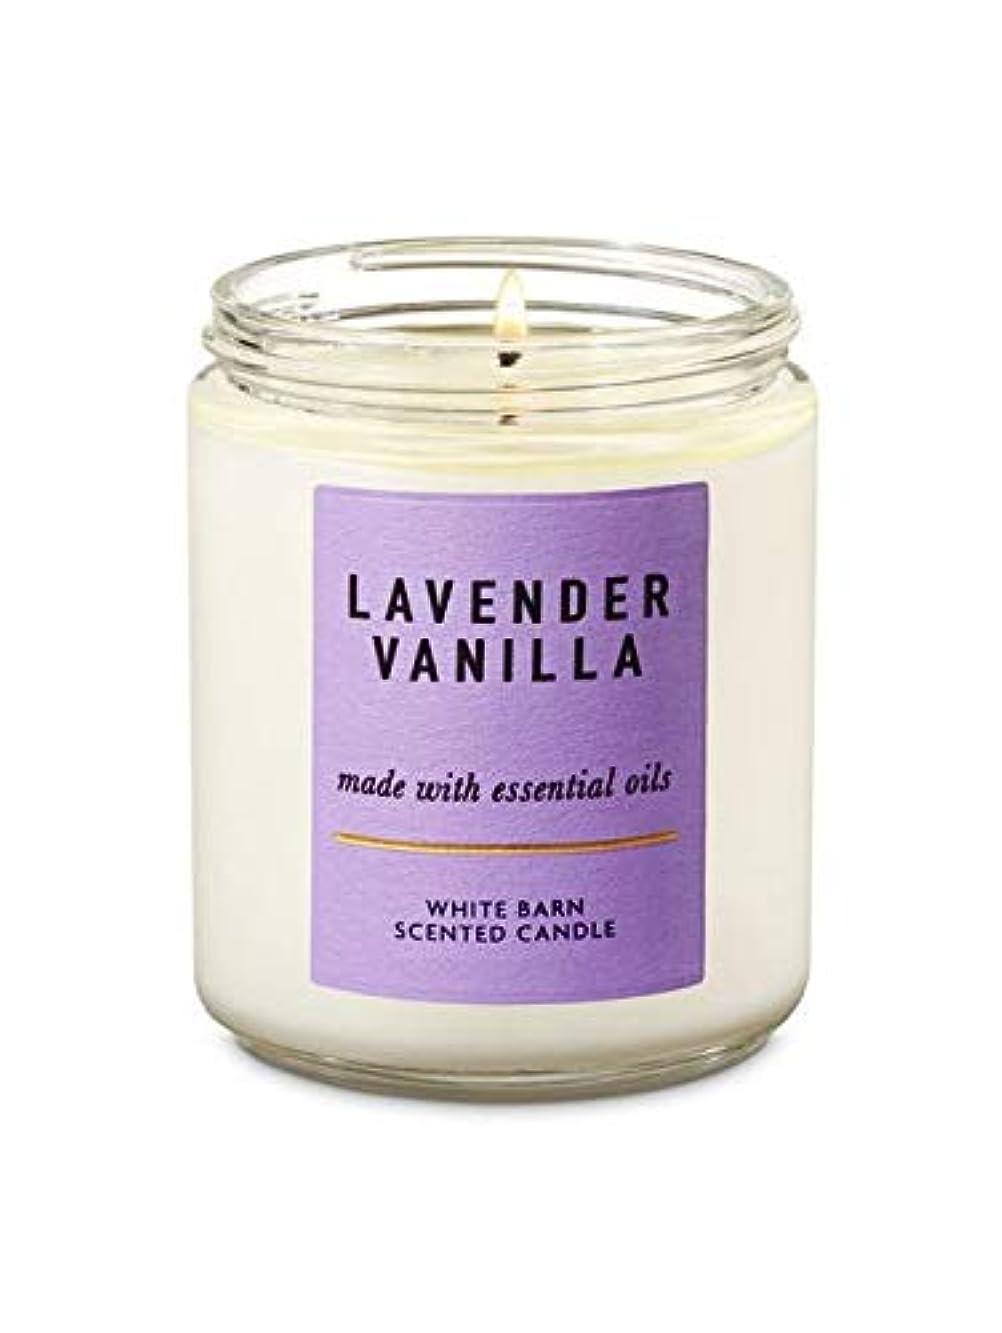 【Bath&Body Works/バス&ボディワークス】 アロマキャンドル ラベンダーバニラ 1-Wick Scented Candle Lavender Vanilla 7oz/198g [並行輸入品]